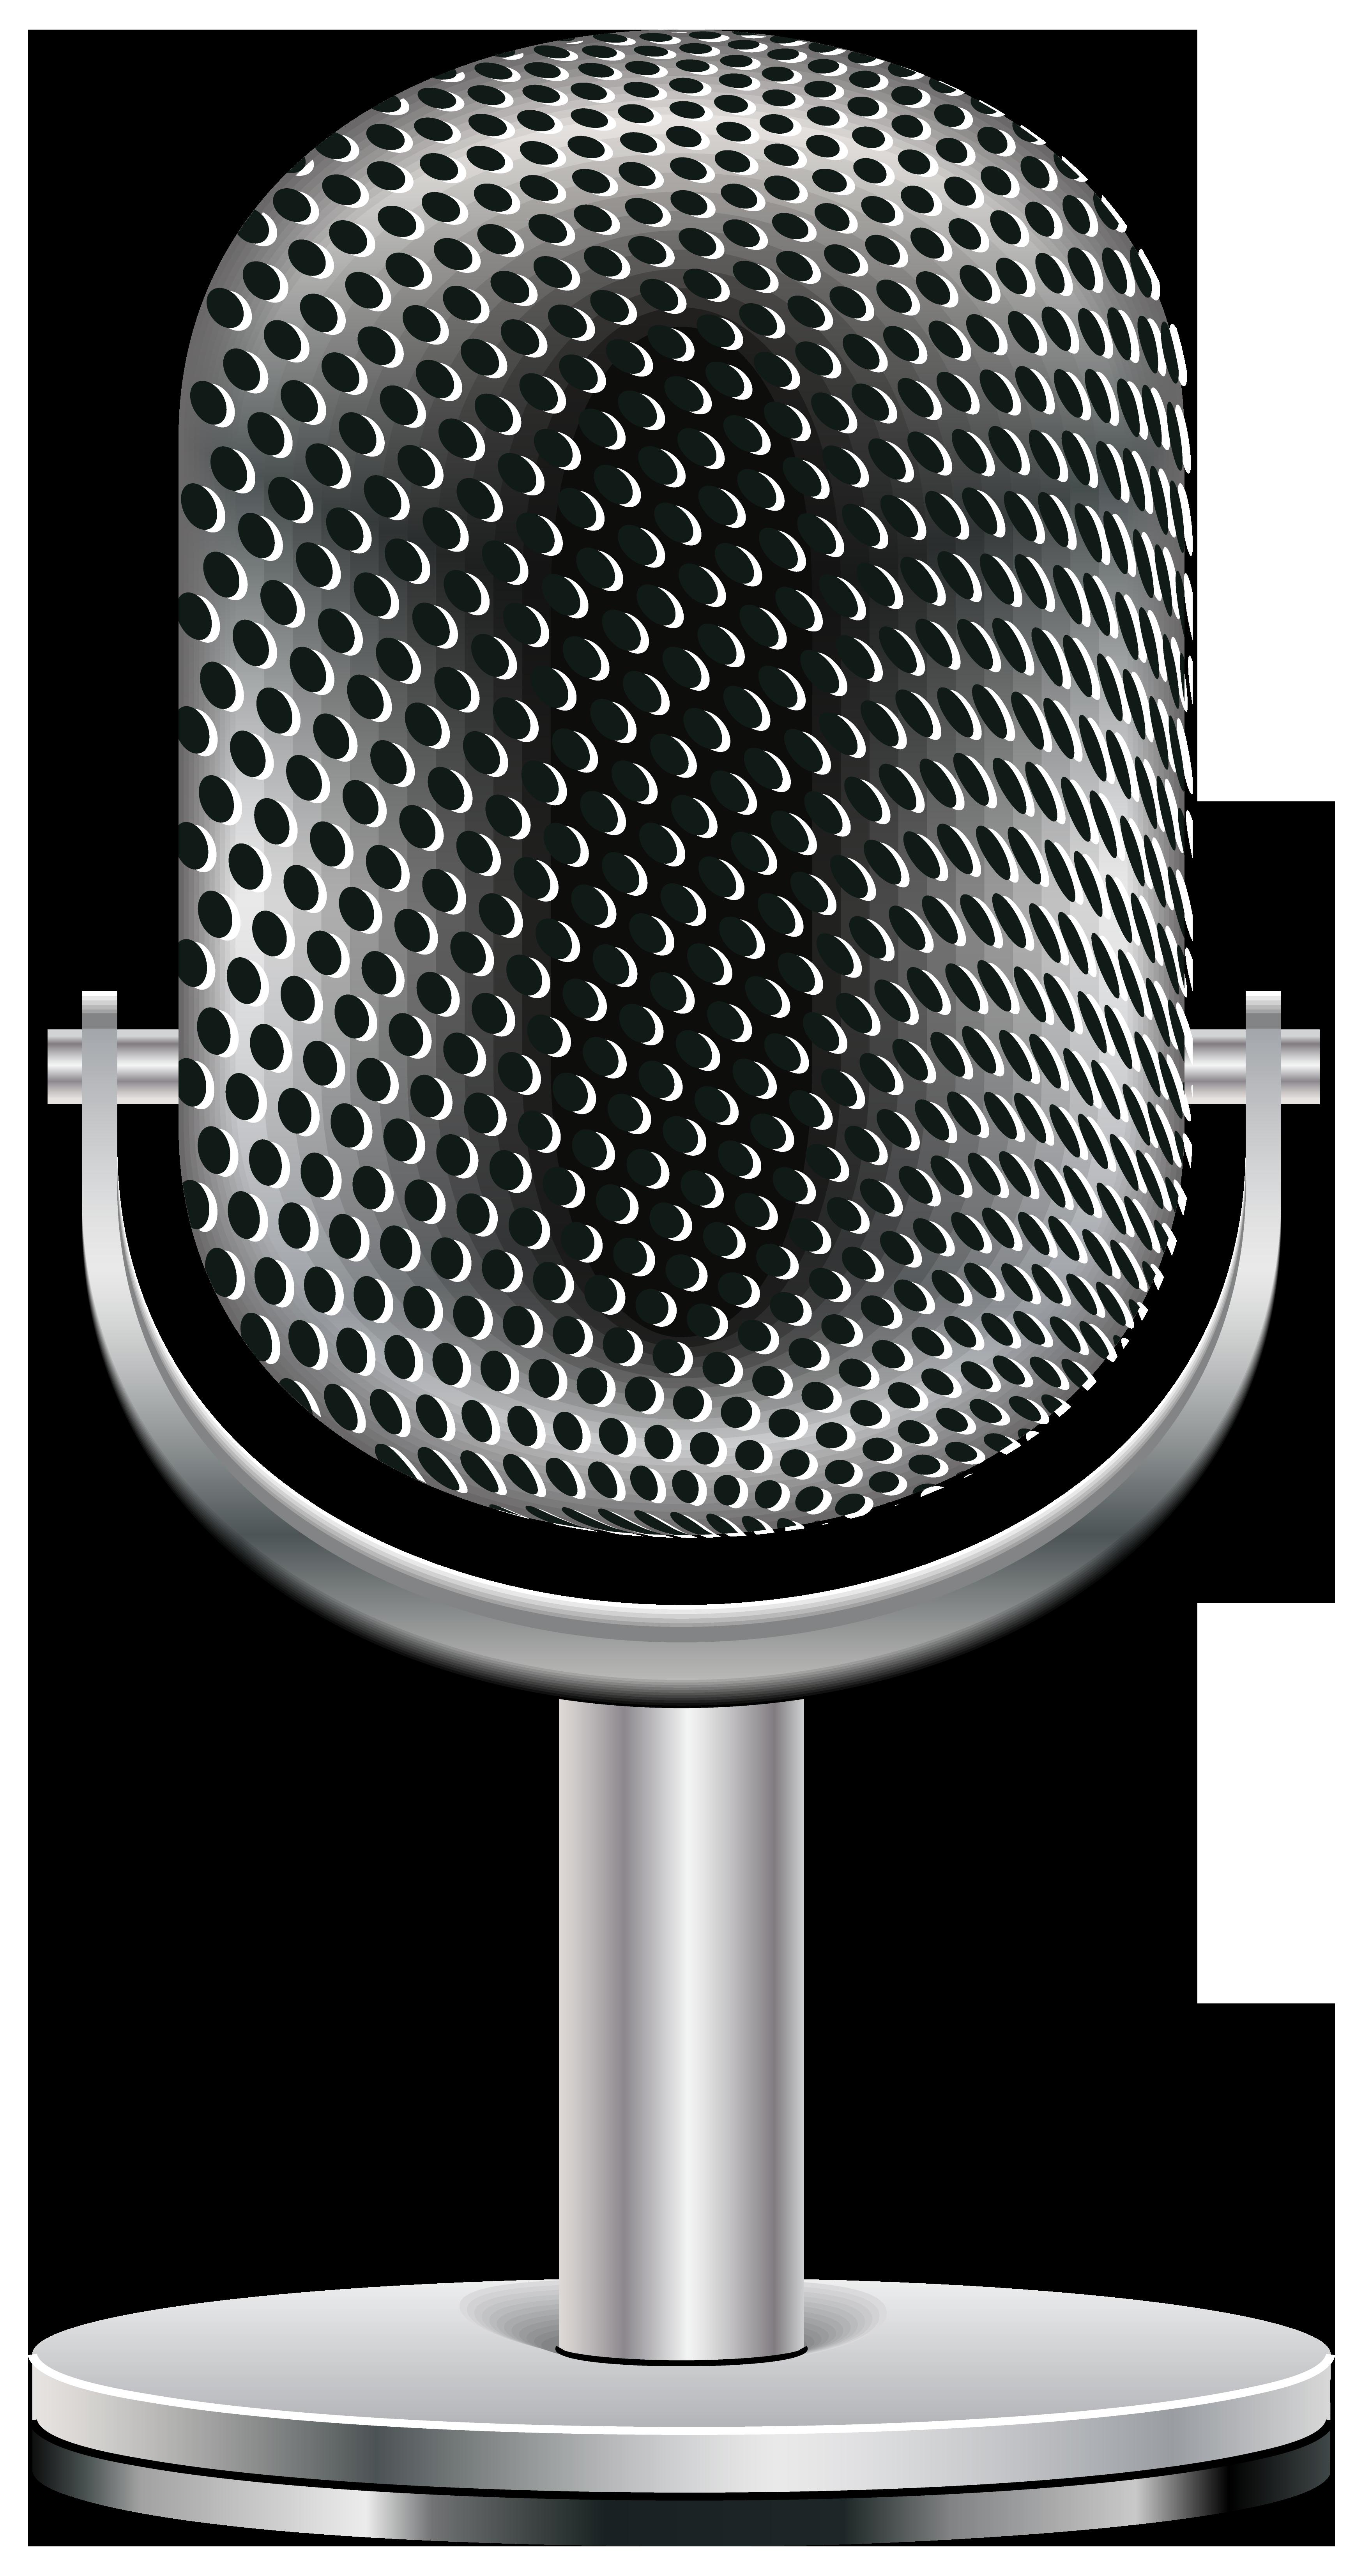 Microphone clipart group. Transparent png clip art